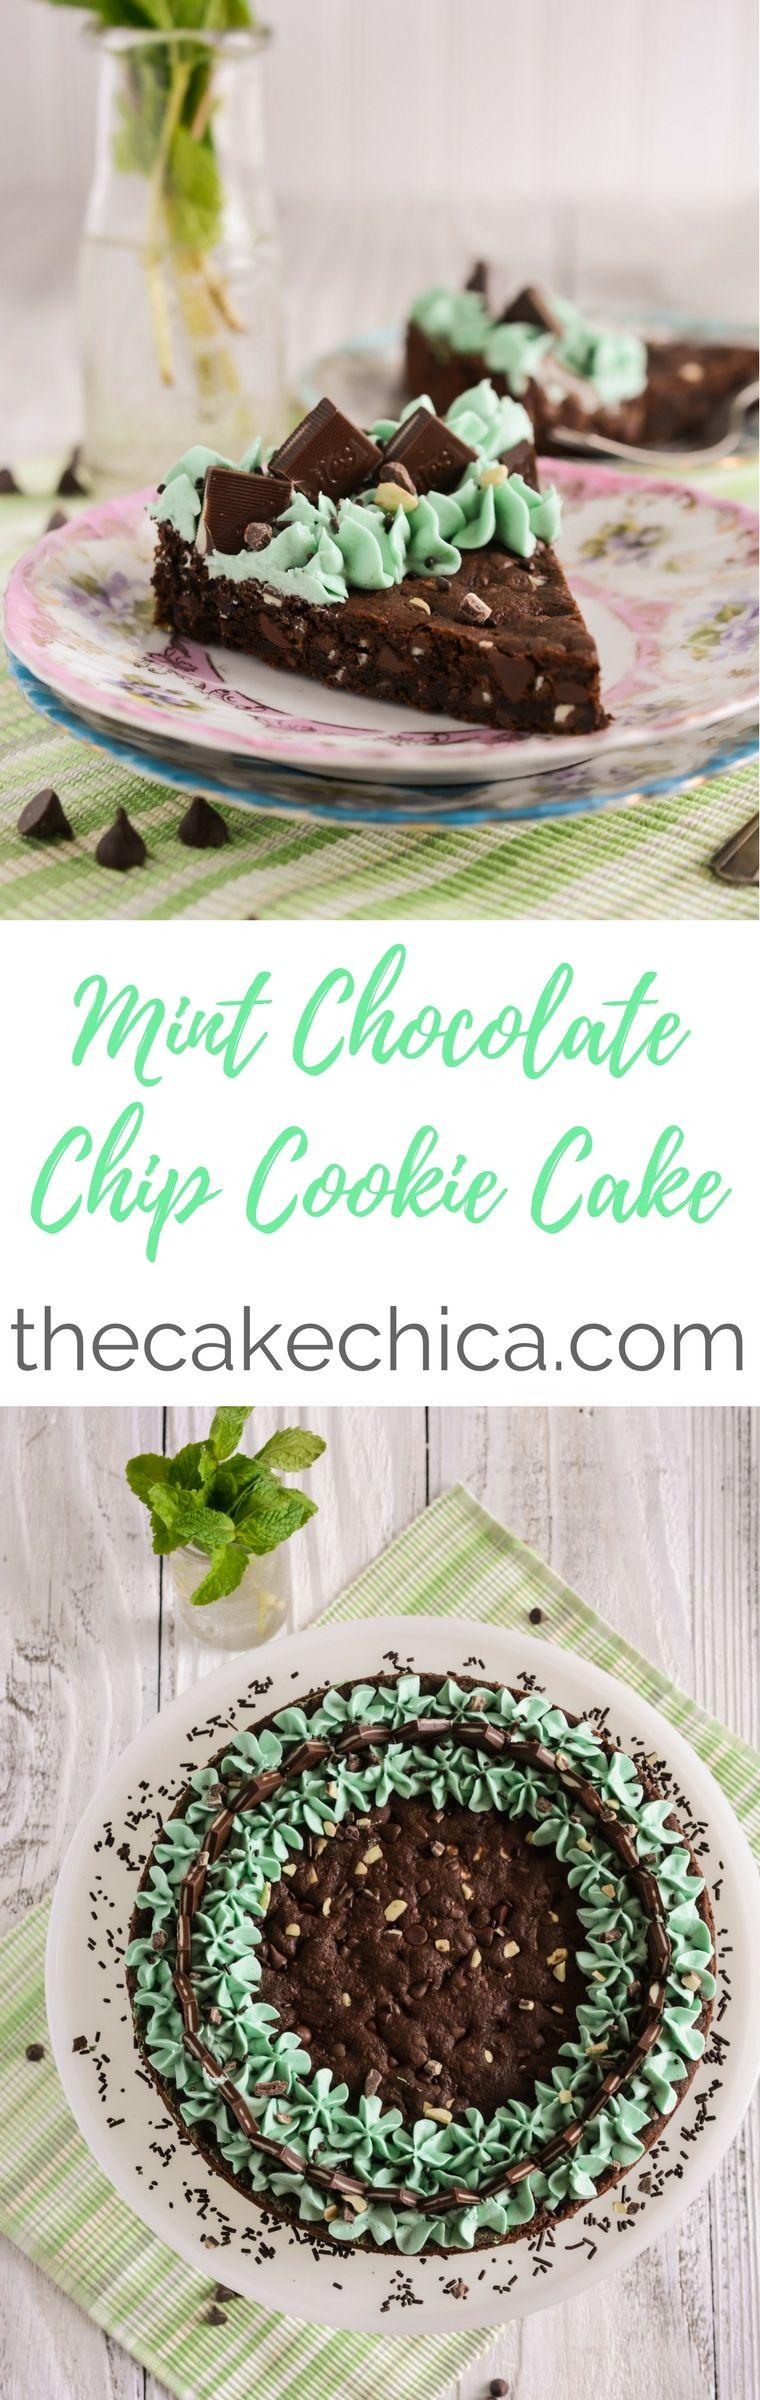 Mint chocolate chip cookie cake recipe mint chocolate